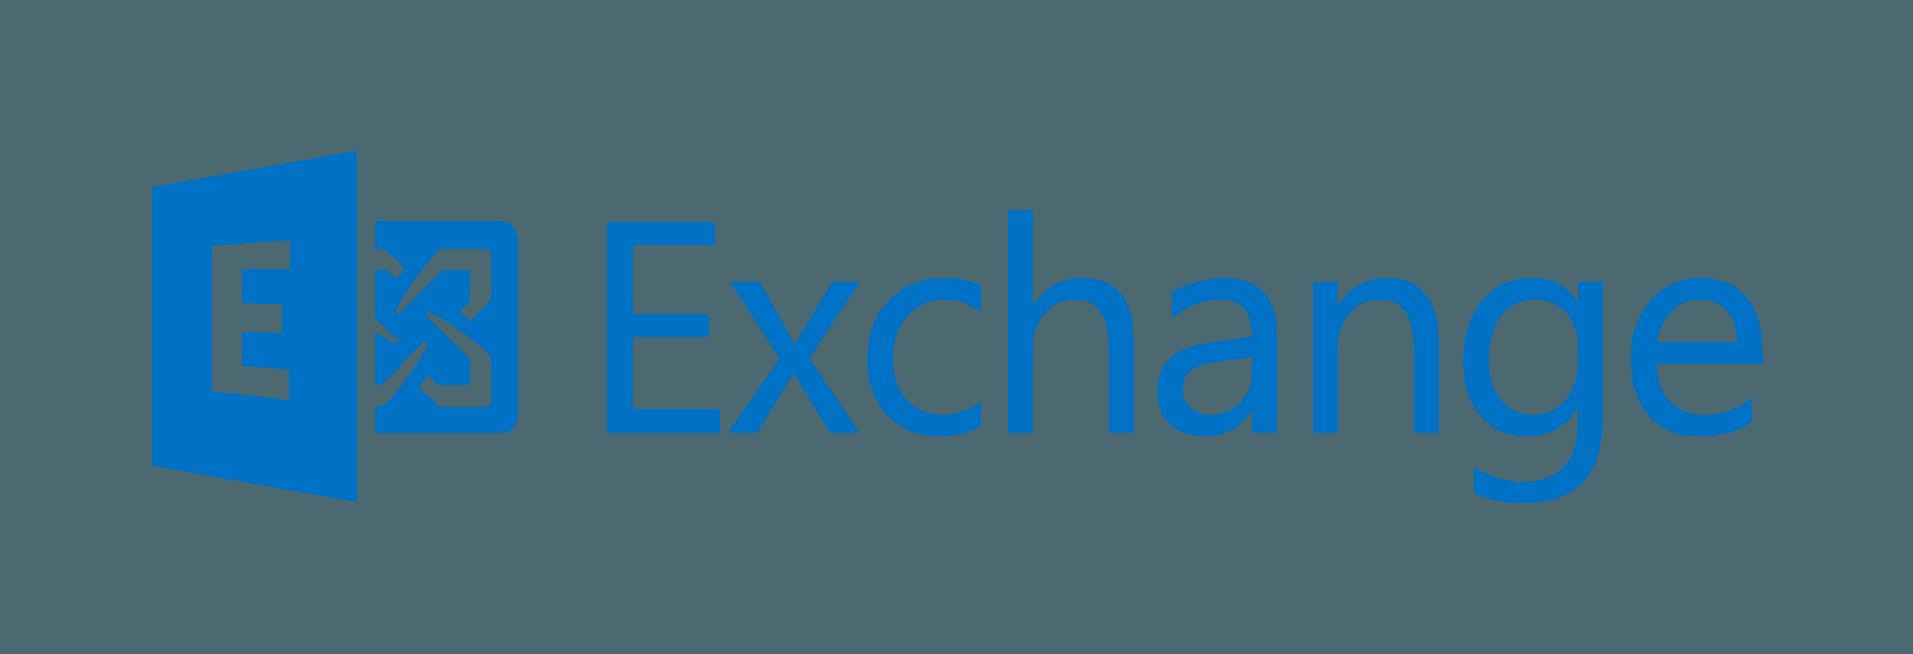 Microsoft Exchange Signup سامانه ثبت نام